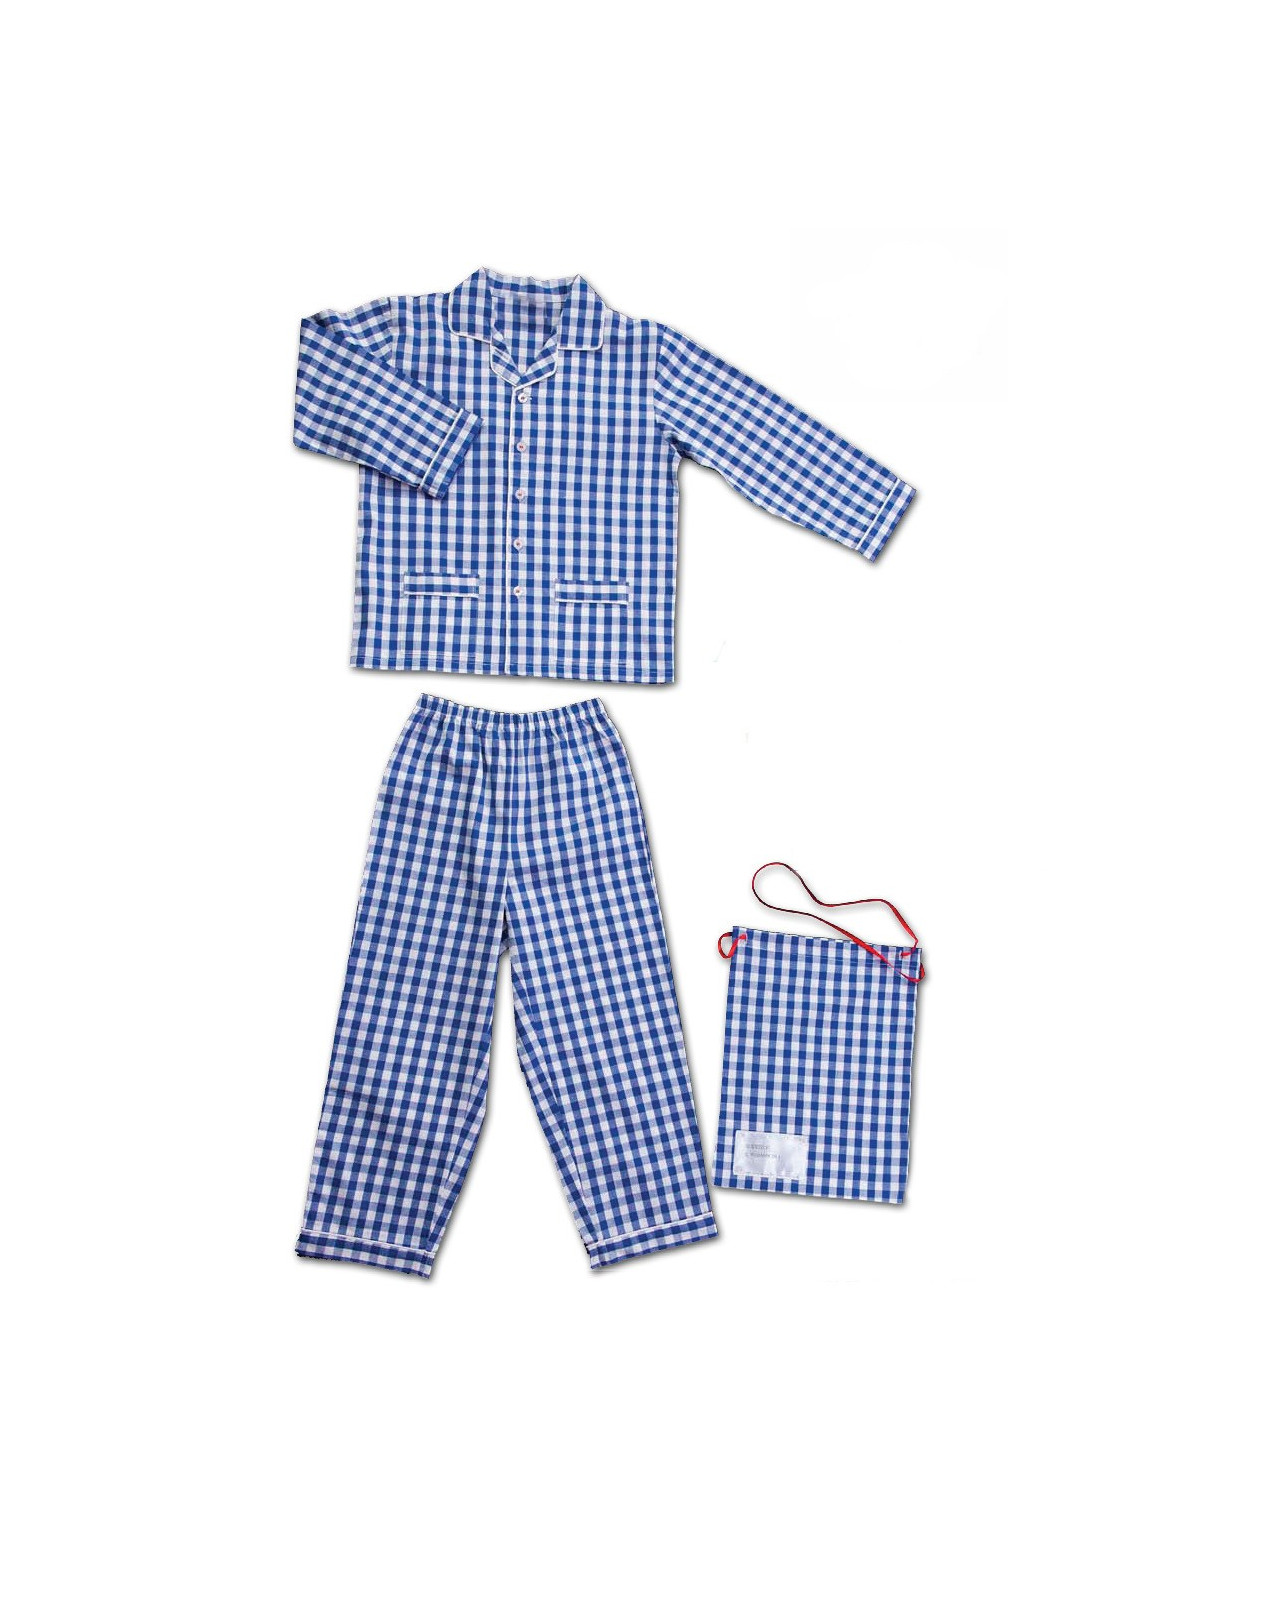 Children pajamas in pure cotton gingham fabric